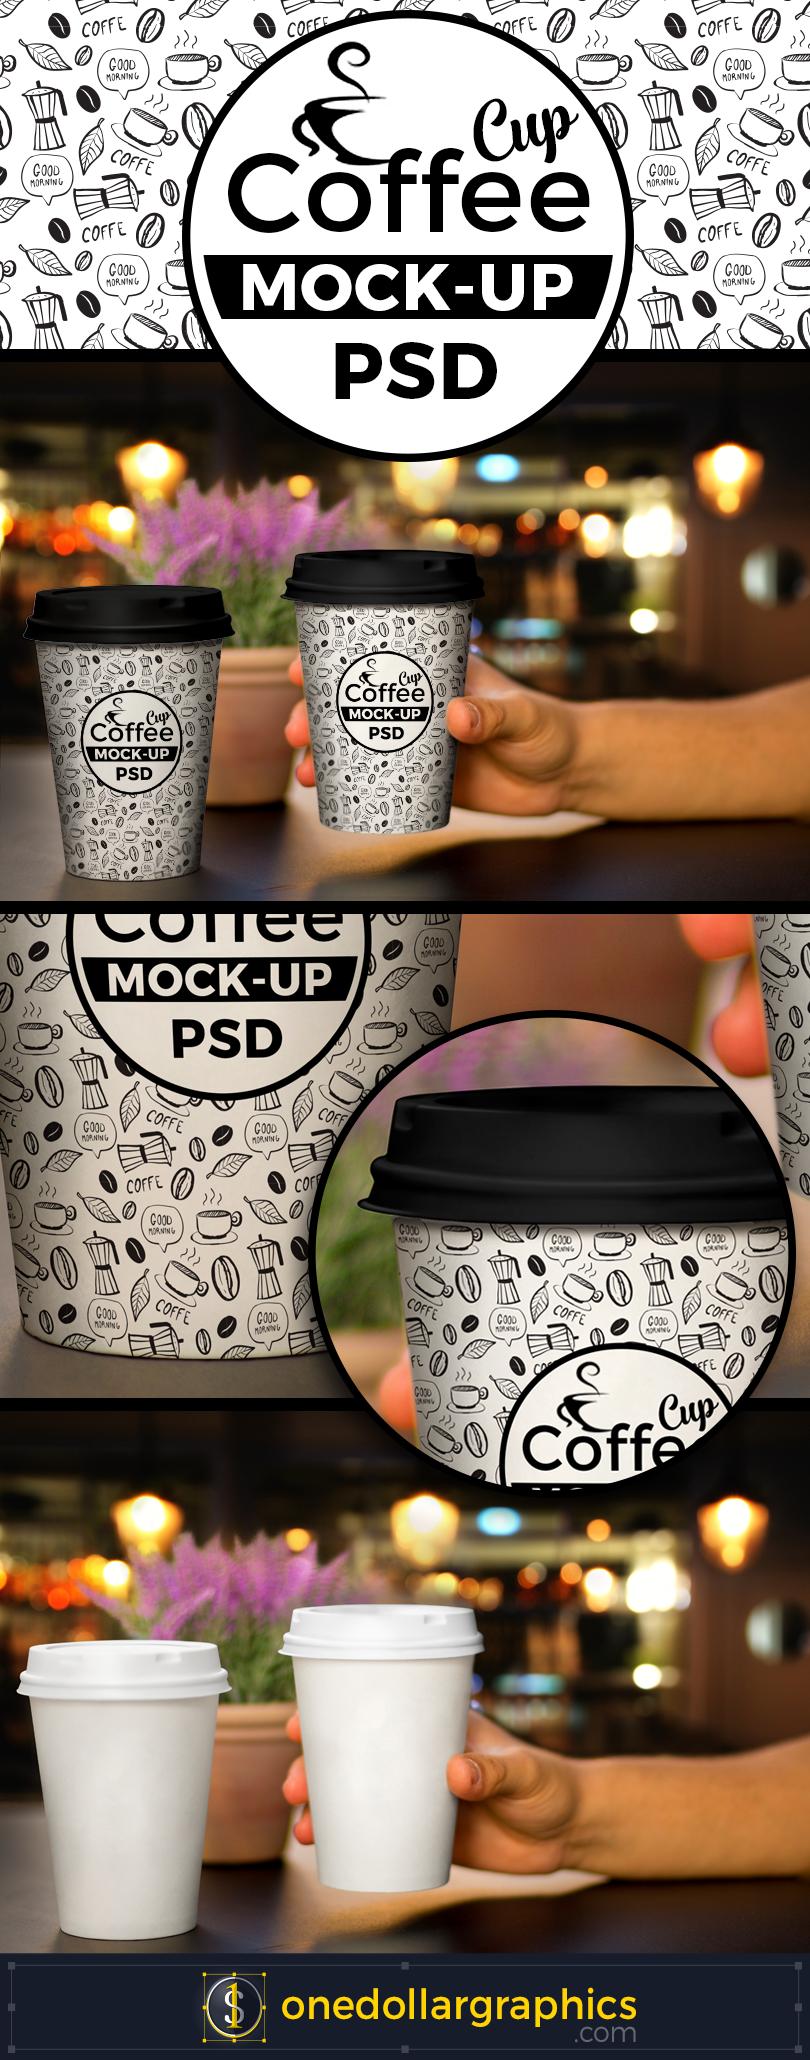 Free-Coffee-Cup-Mockup-PSD-Post-2